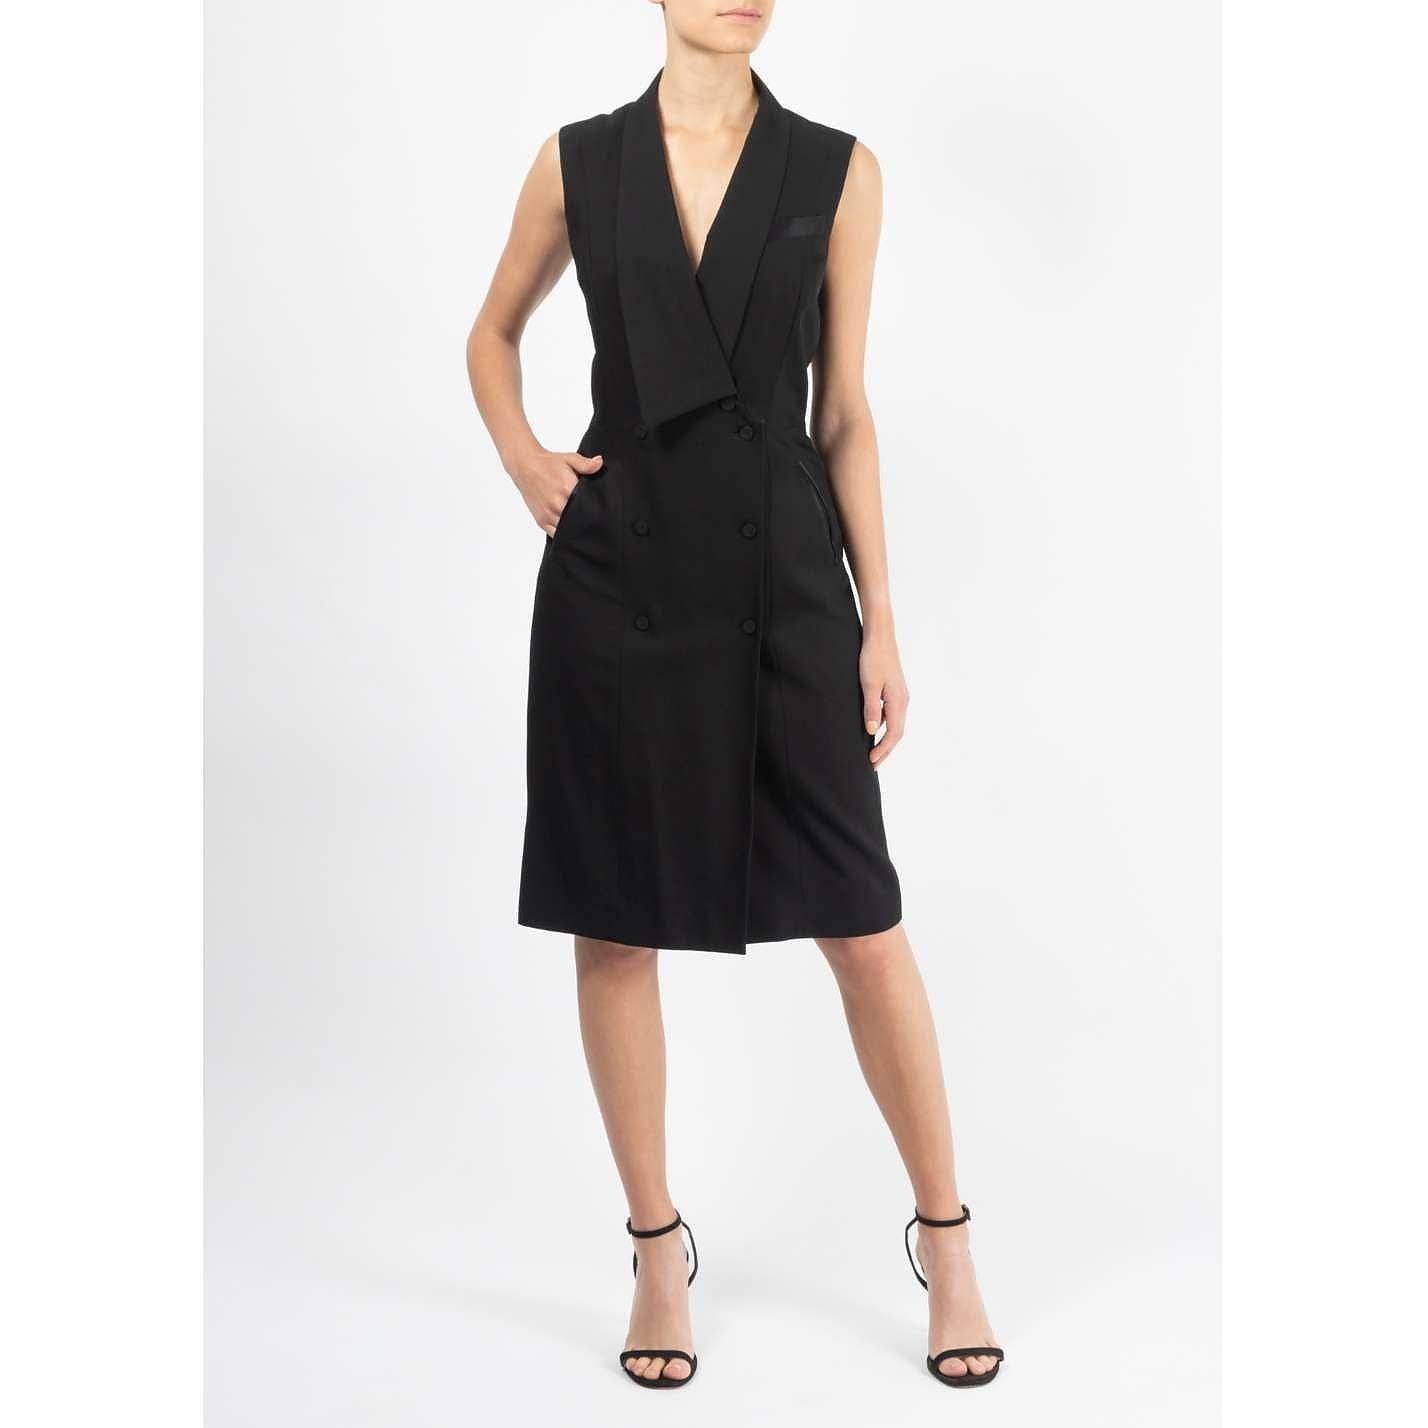 Temperley London Sleeveless Tuxedo Dress